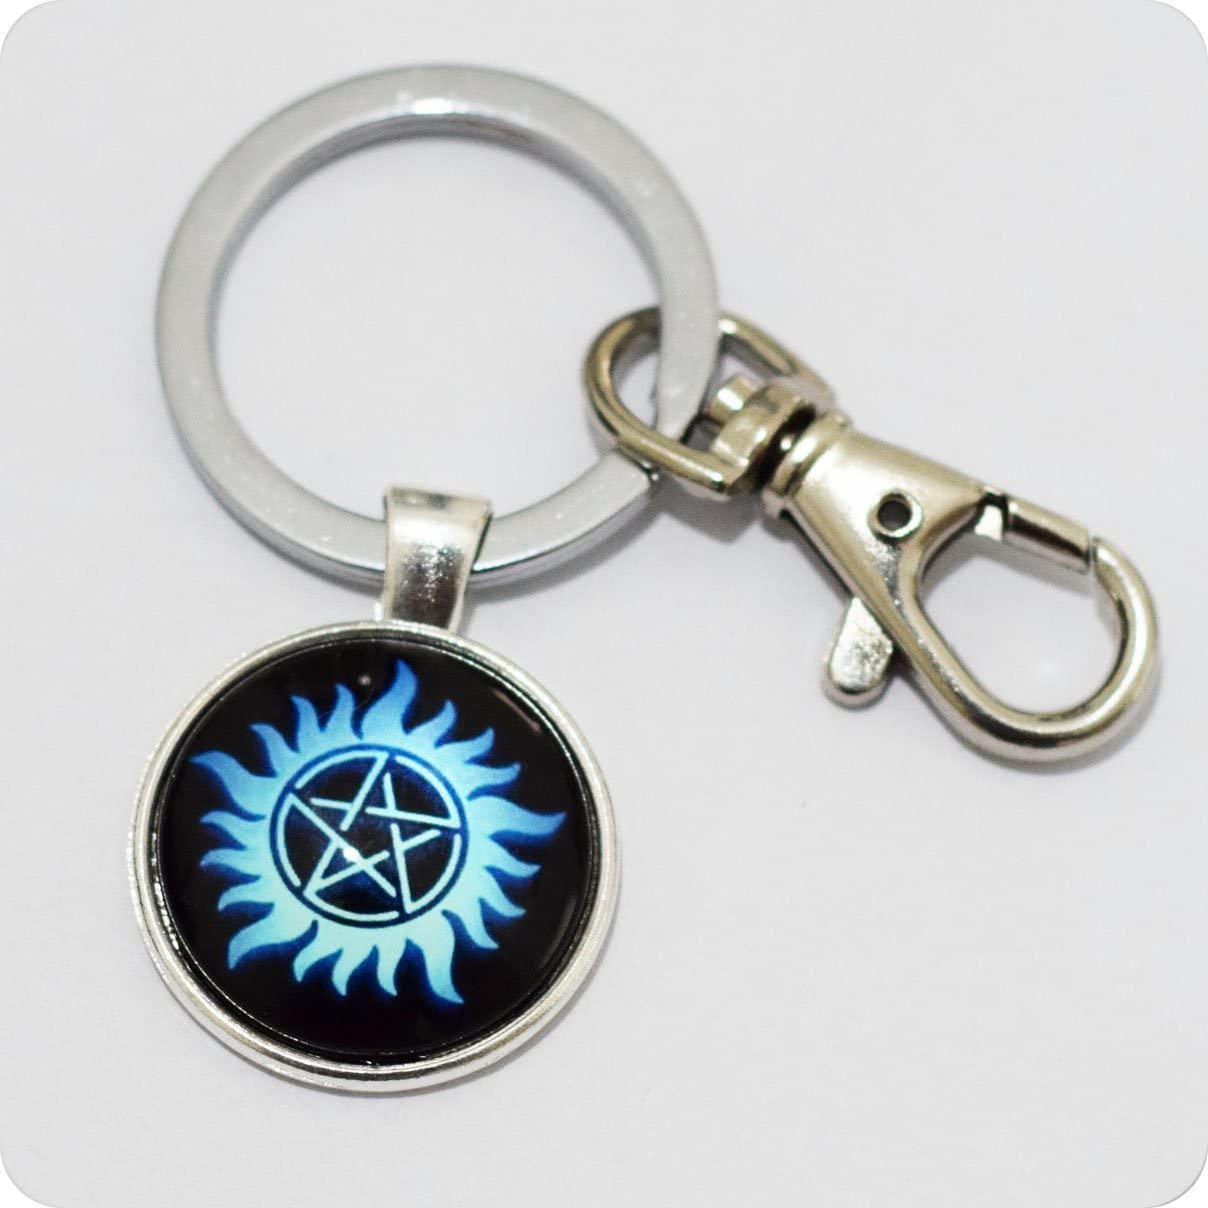 Keychain Supernatural Anti Possession Pentagram Choker Supernatural Supernatural Inspired Keychain Supernatural Keychain Pentagram Keychain